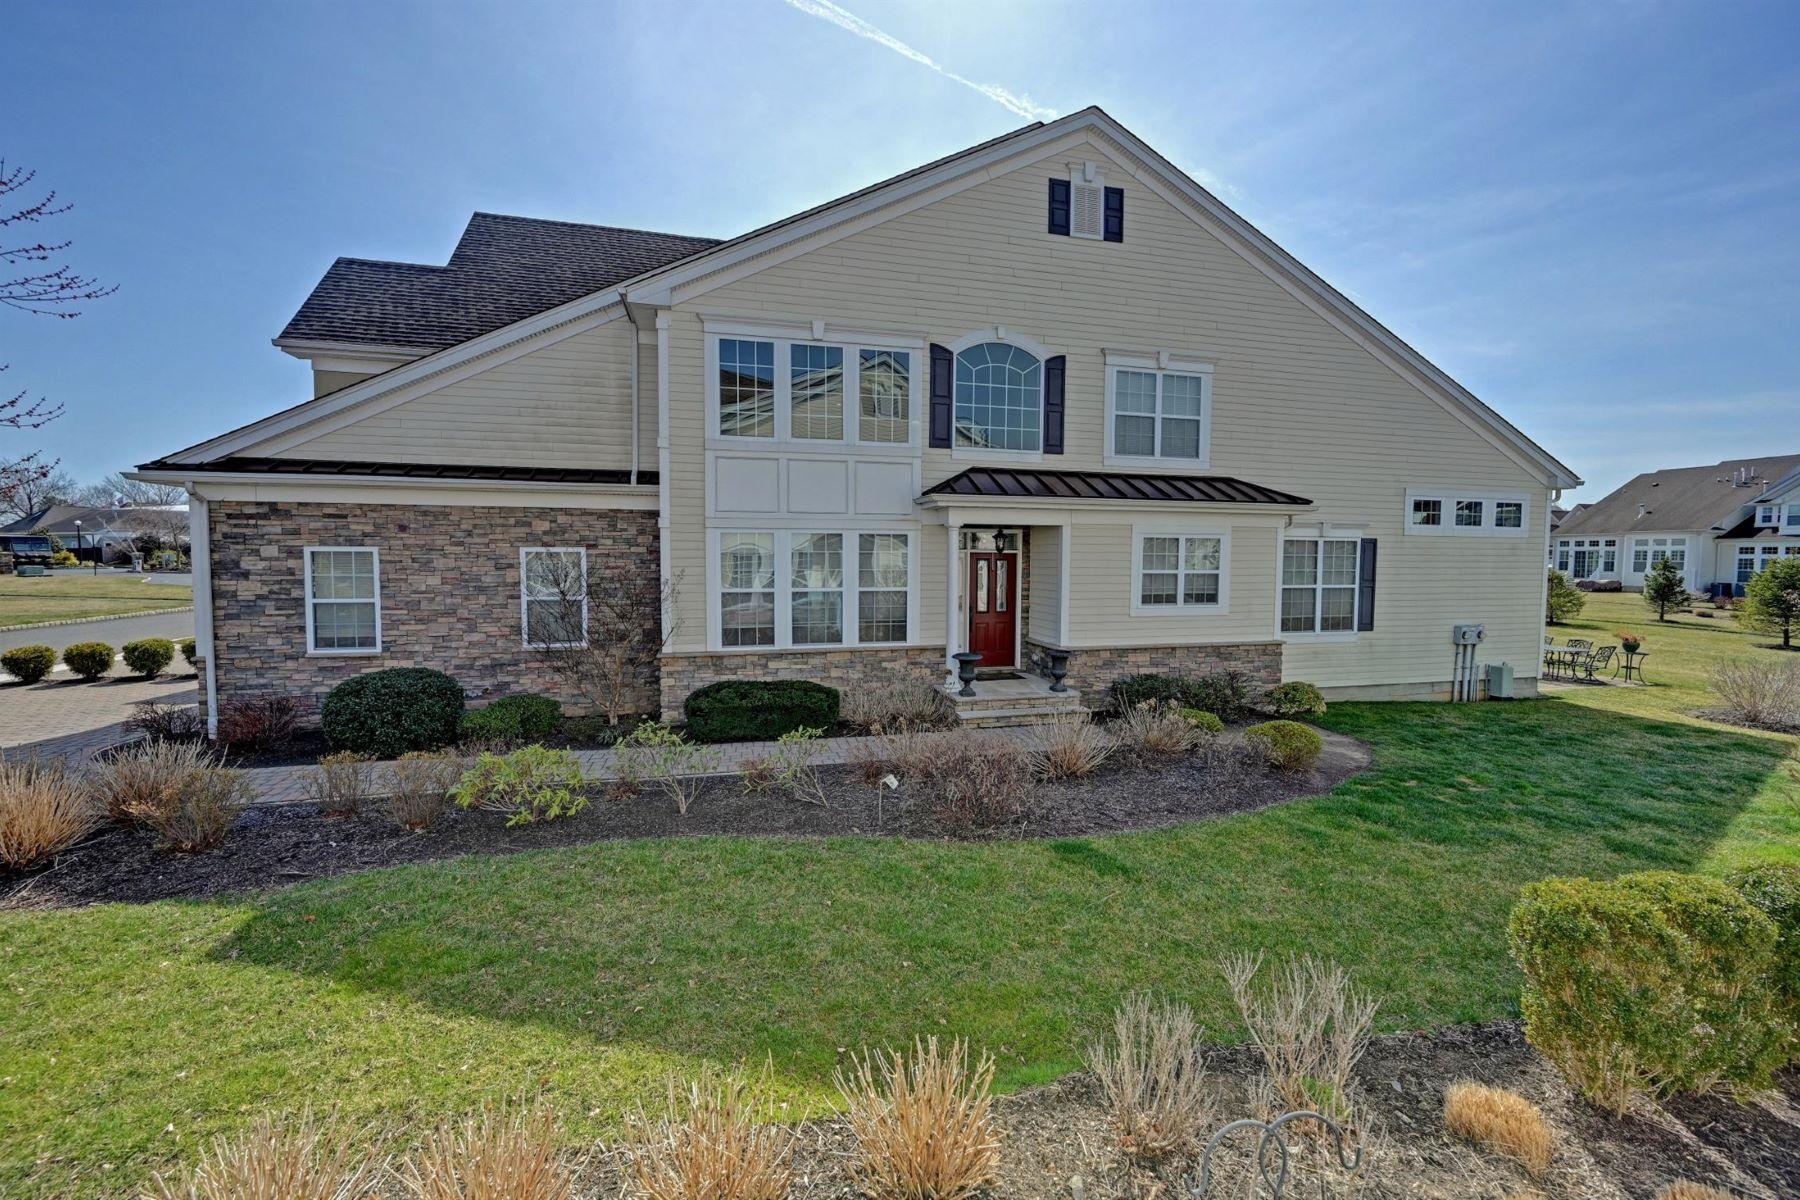 Condominiums 为 销售 在 Greenbriar Falls Townhome 29 Aspen Ln, 廷顿瀑布市, 新泽西州 07724 美国